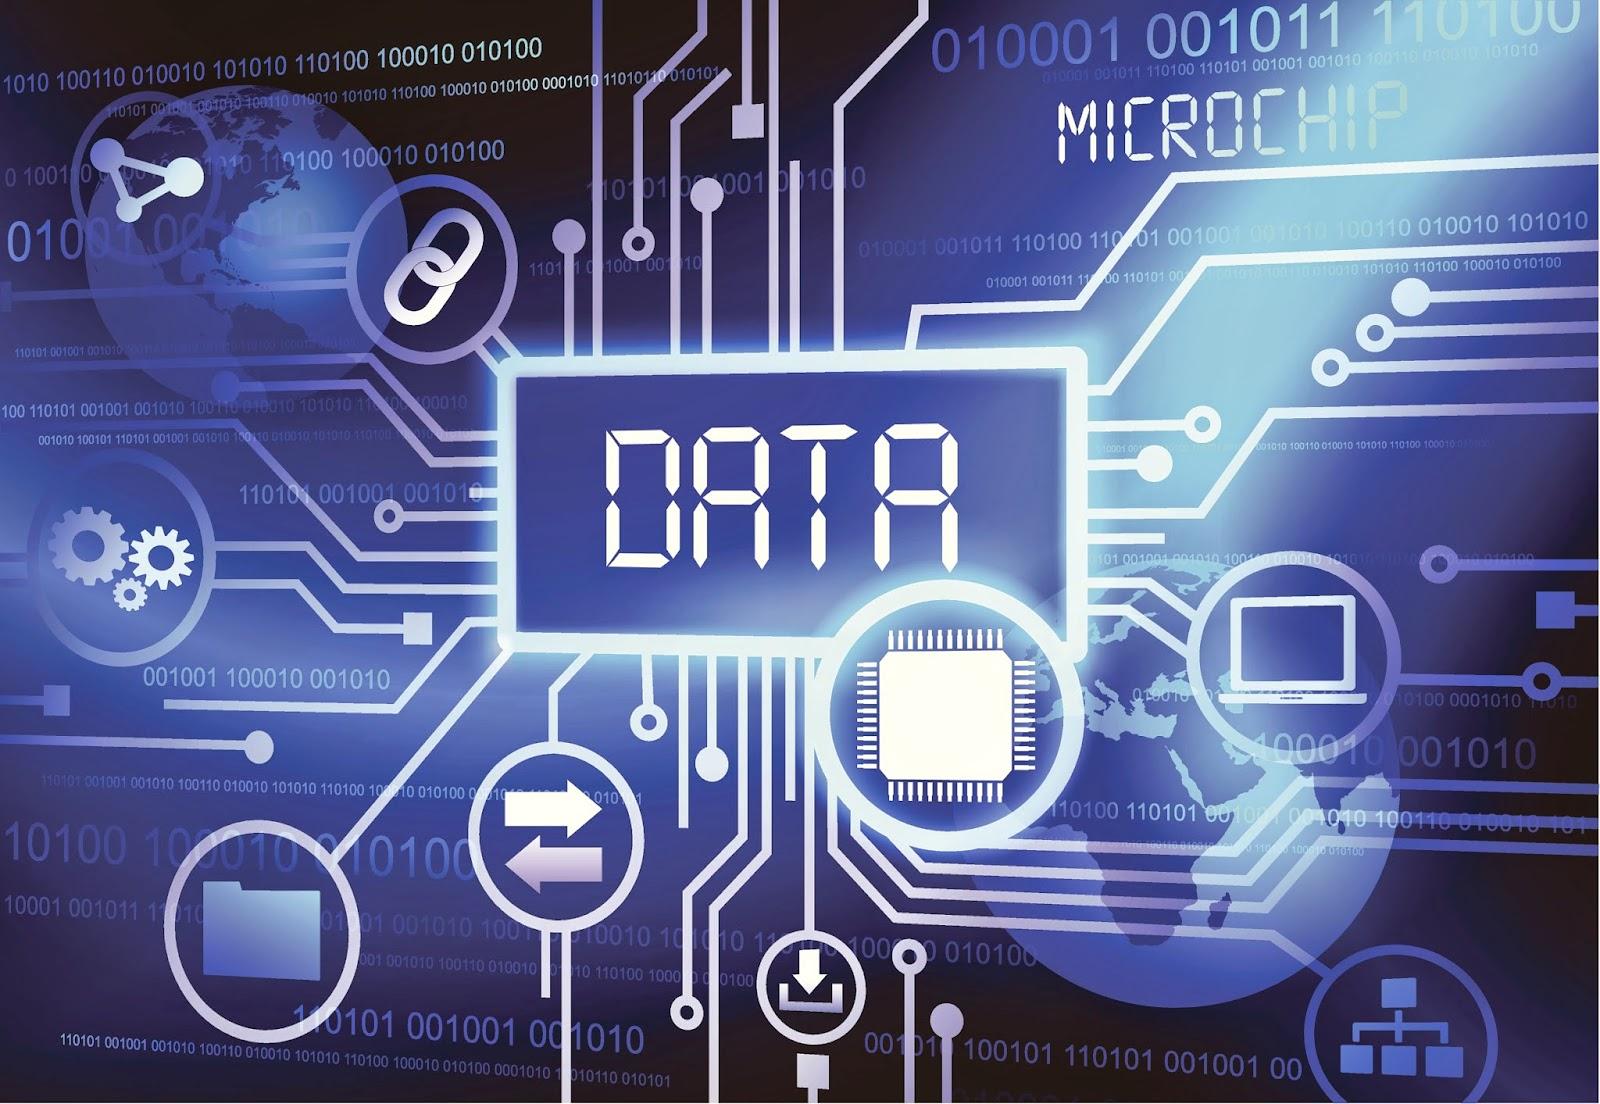 Visual representation of data system